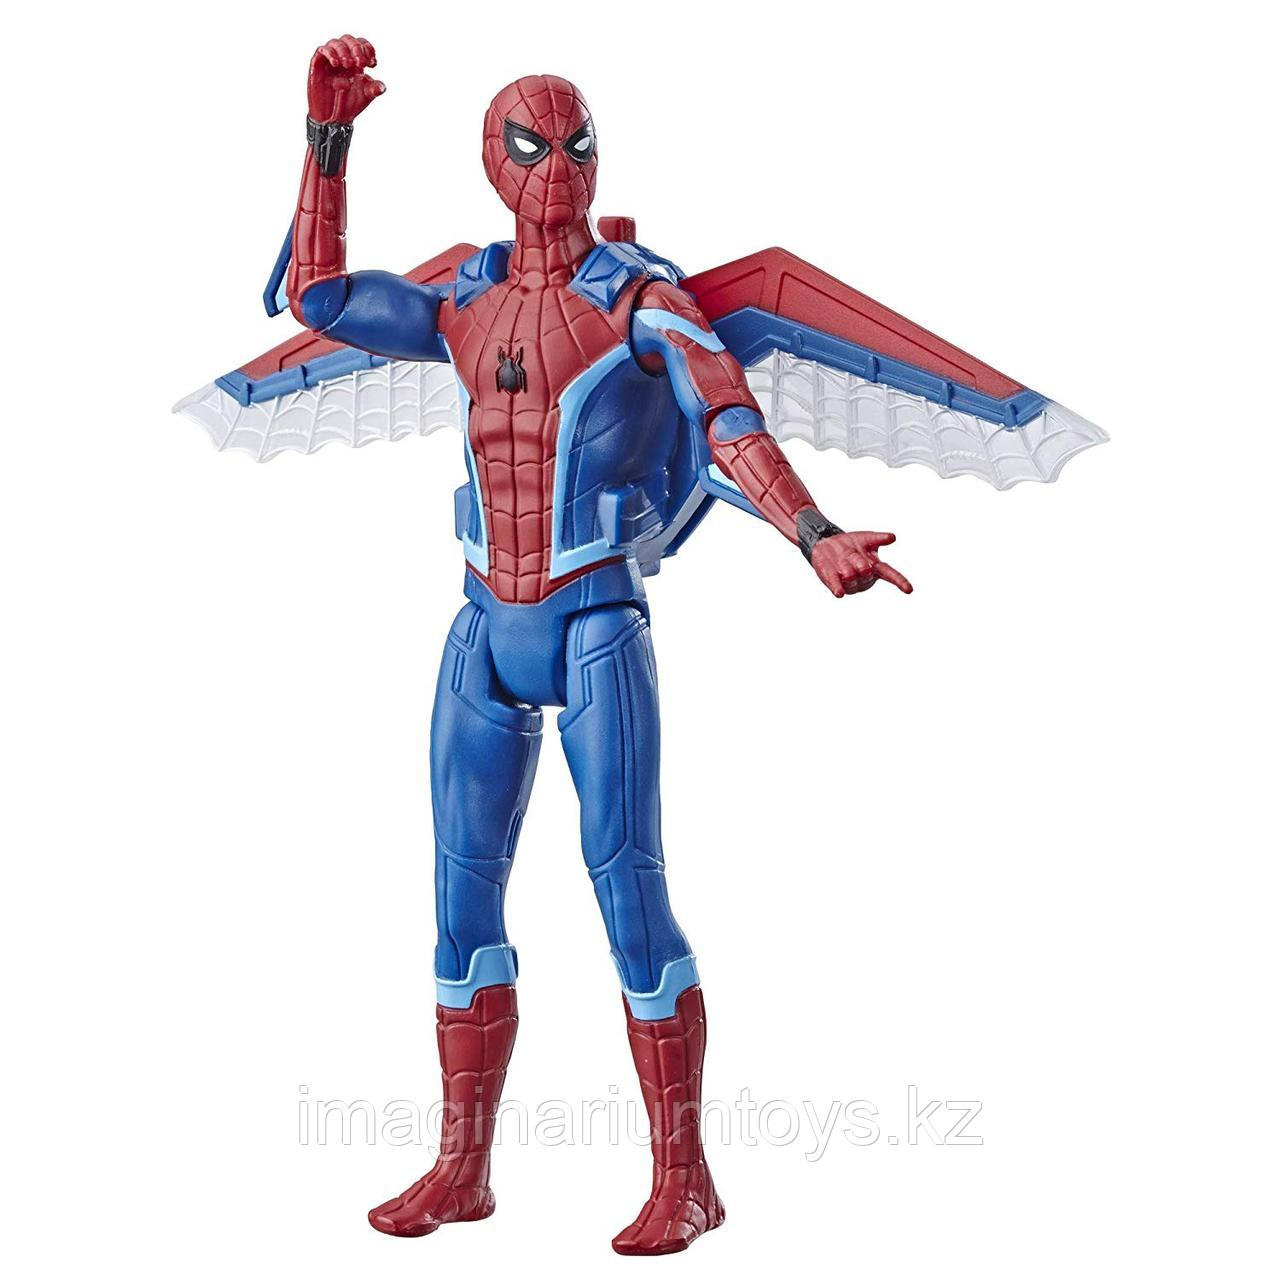 Фигурка Человек-паук  15 см оригинал Hasbro